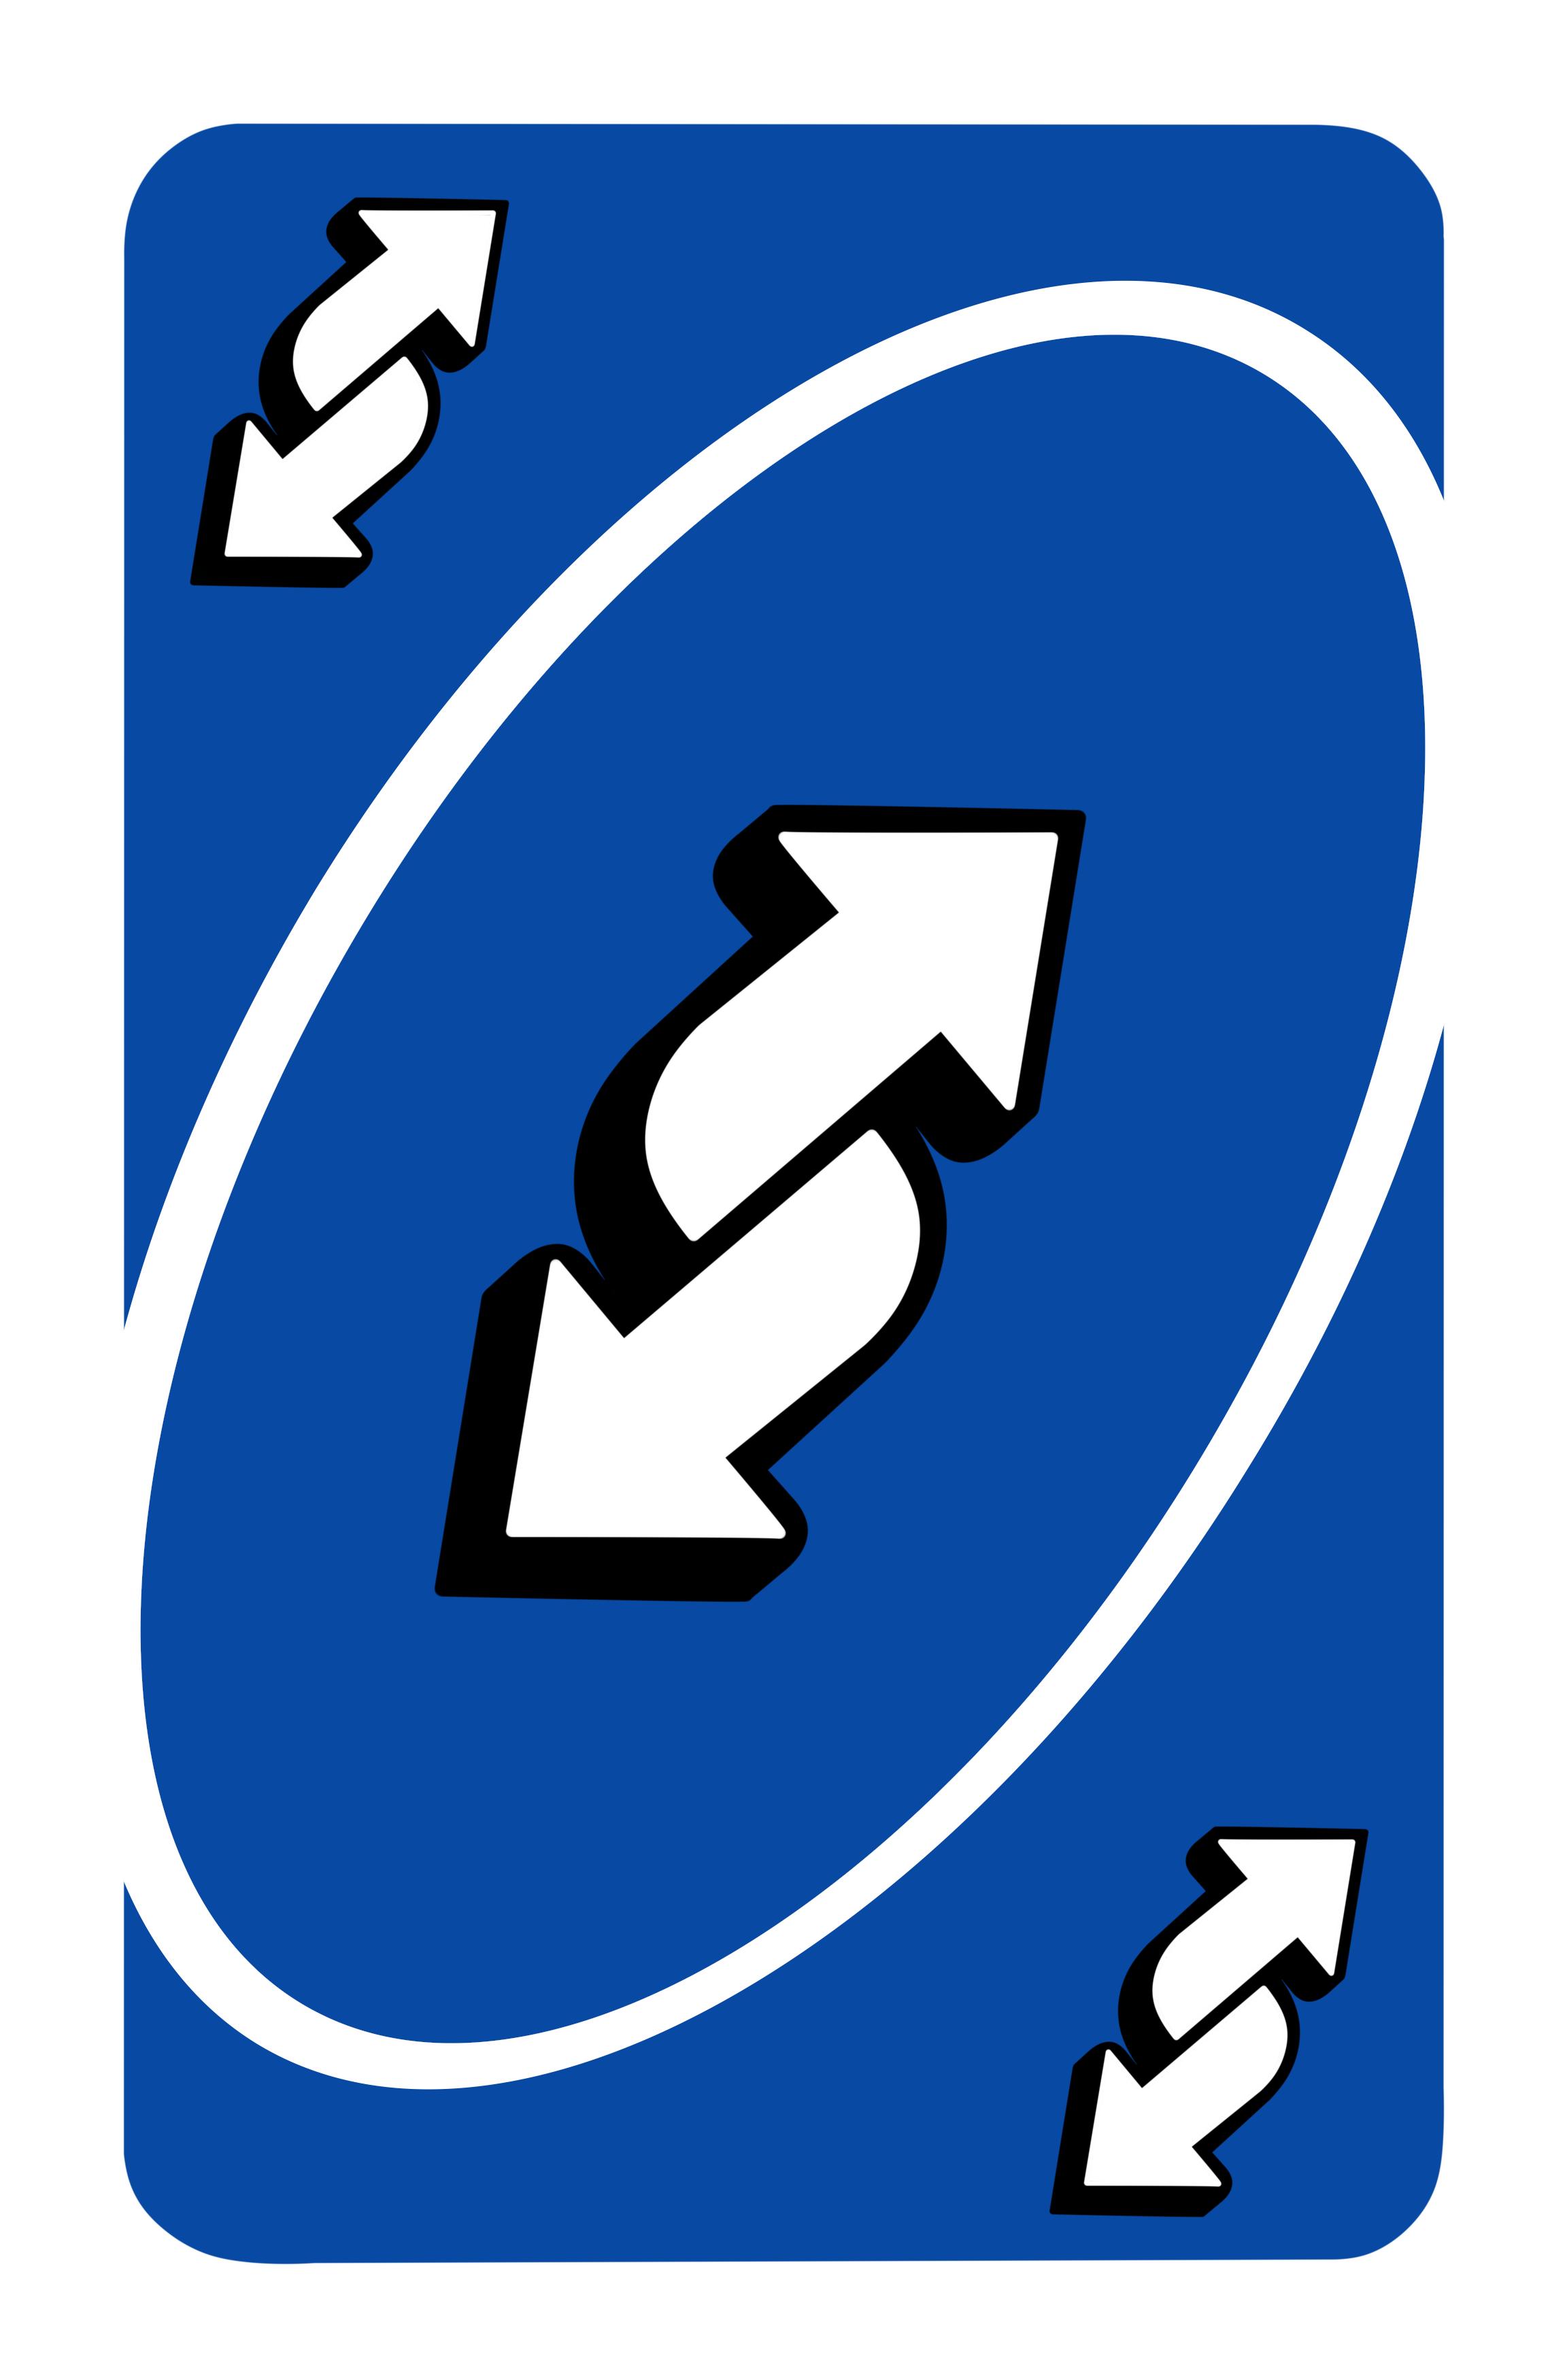 2304x3500 px Blue Uno Reverse Card (4k) by AlexceedDeSasrider on ...